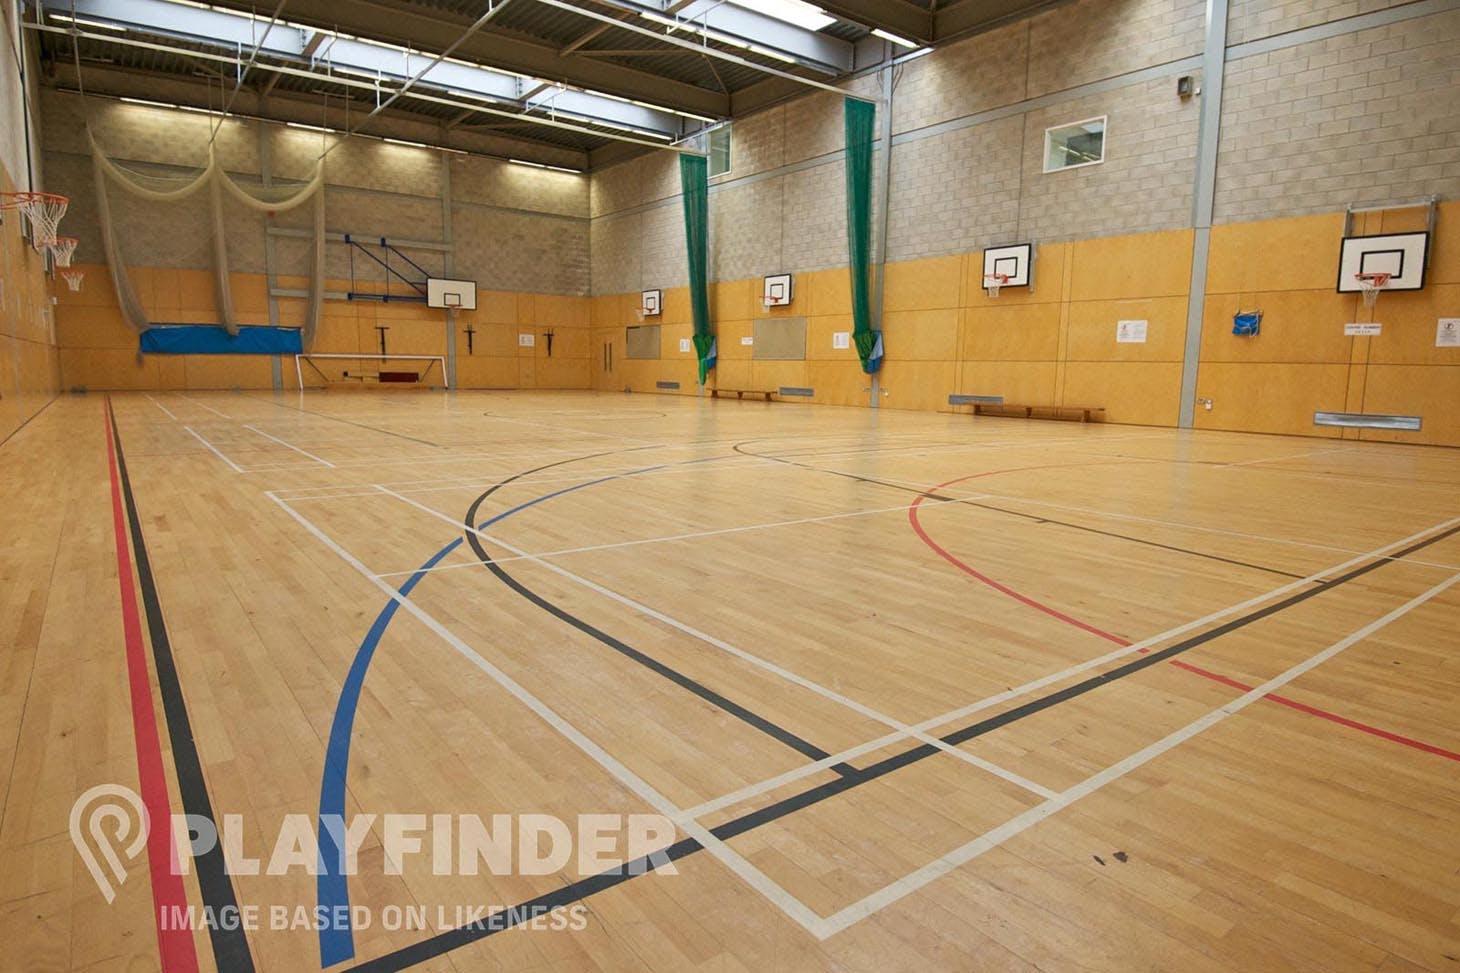 Haberdashers' Aske's Knights Academy Court | Sports hall basketball court